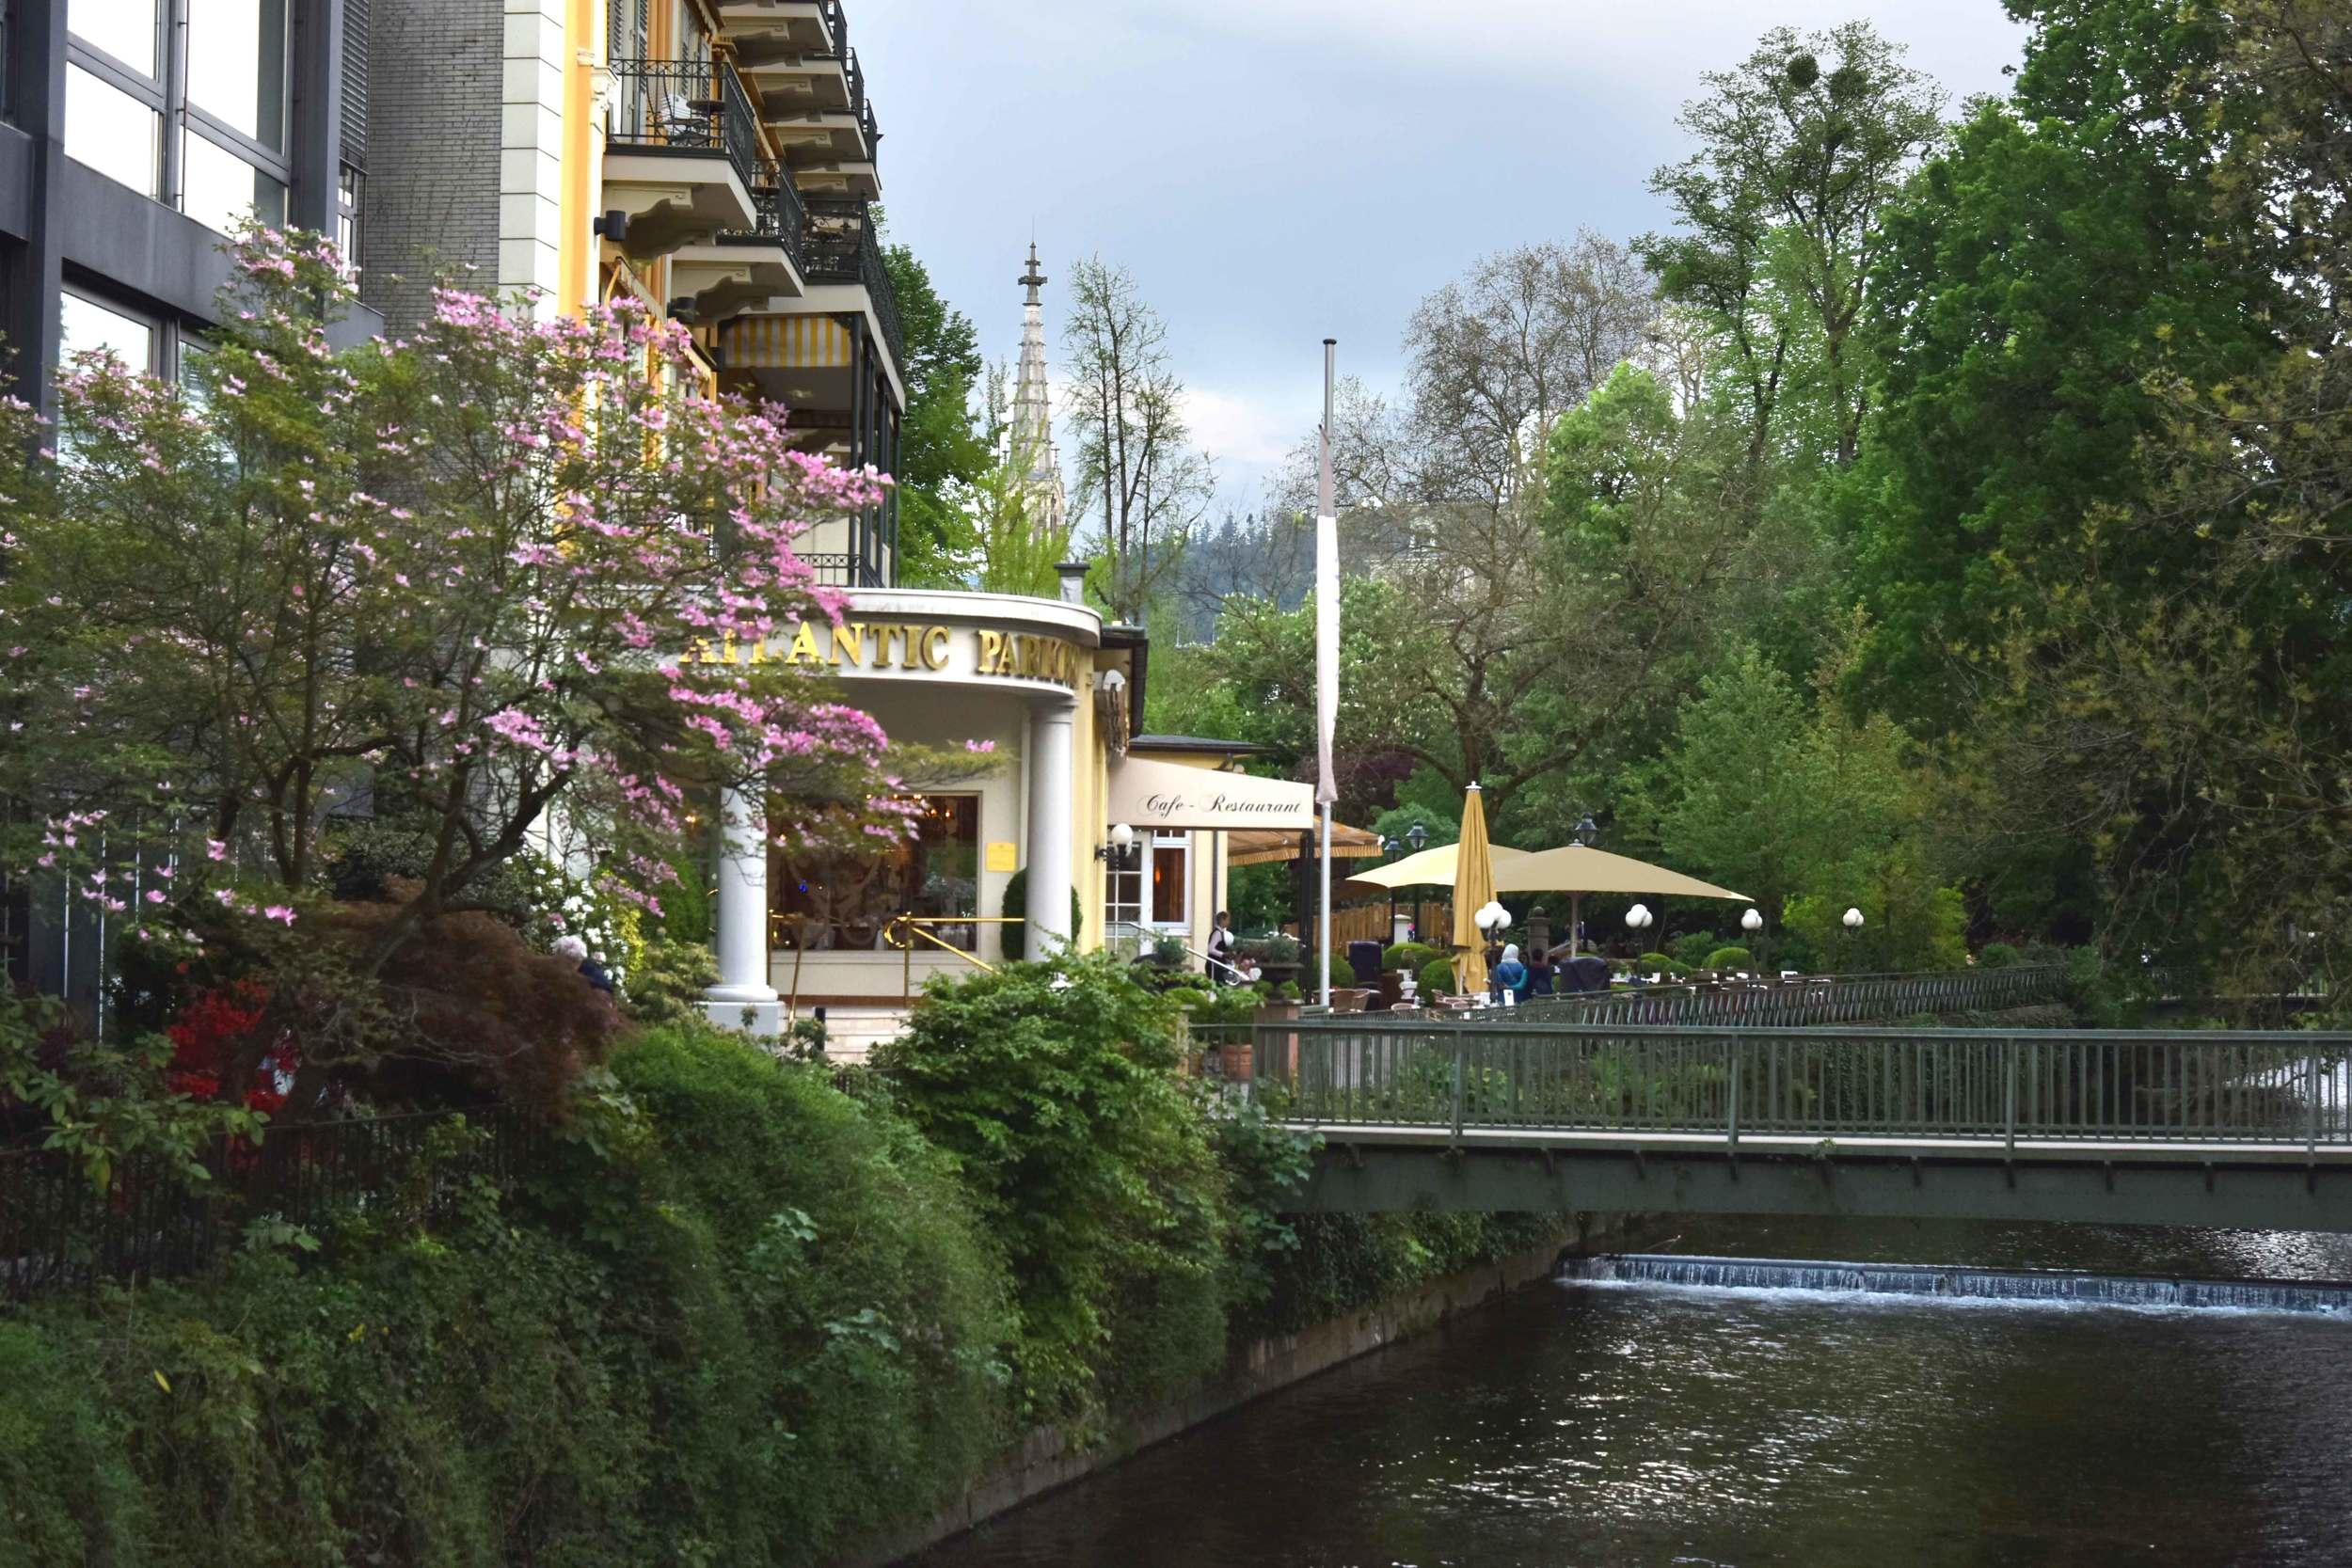 Atlantic Park hotel, Baden Baden, Germany. Image©sourcingstyle.com